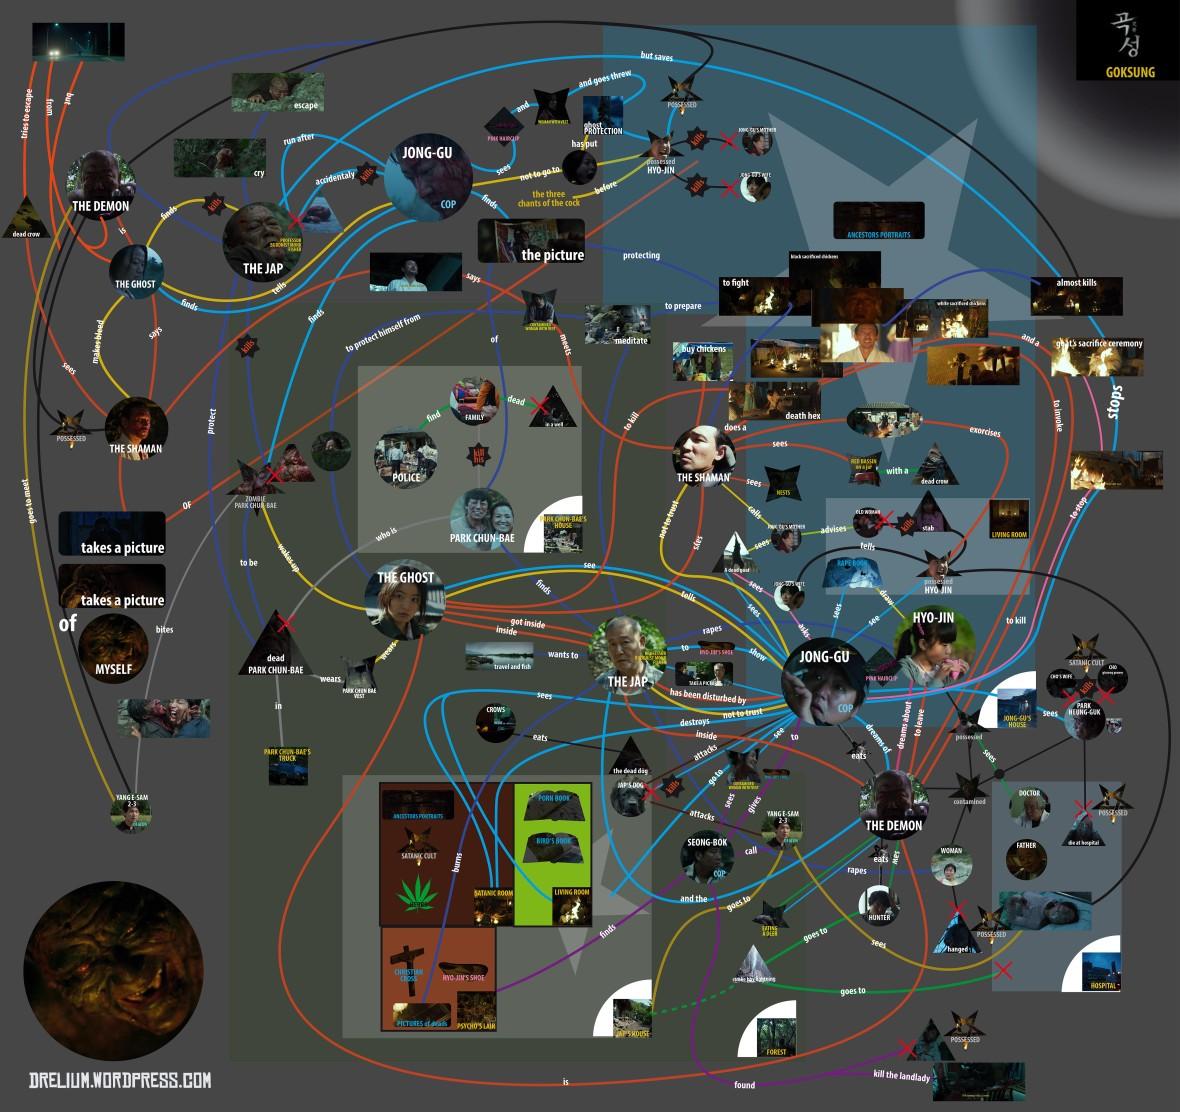 Goksung map